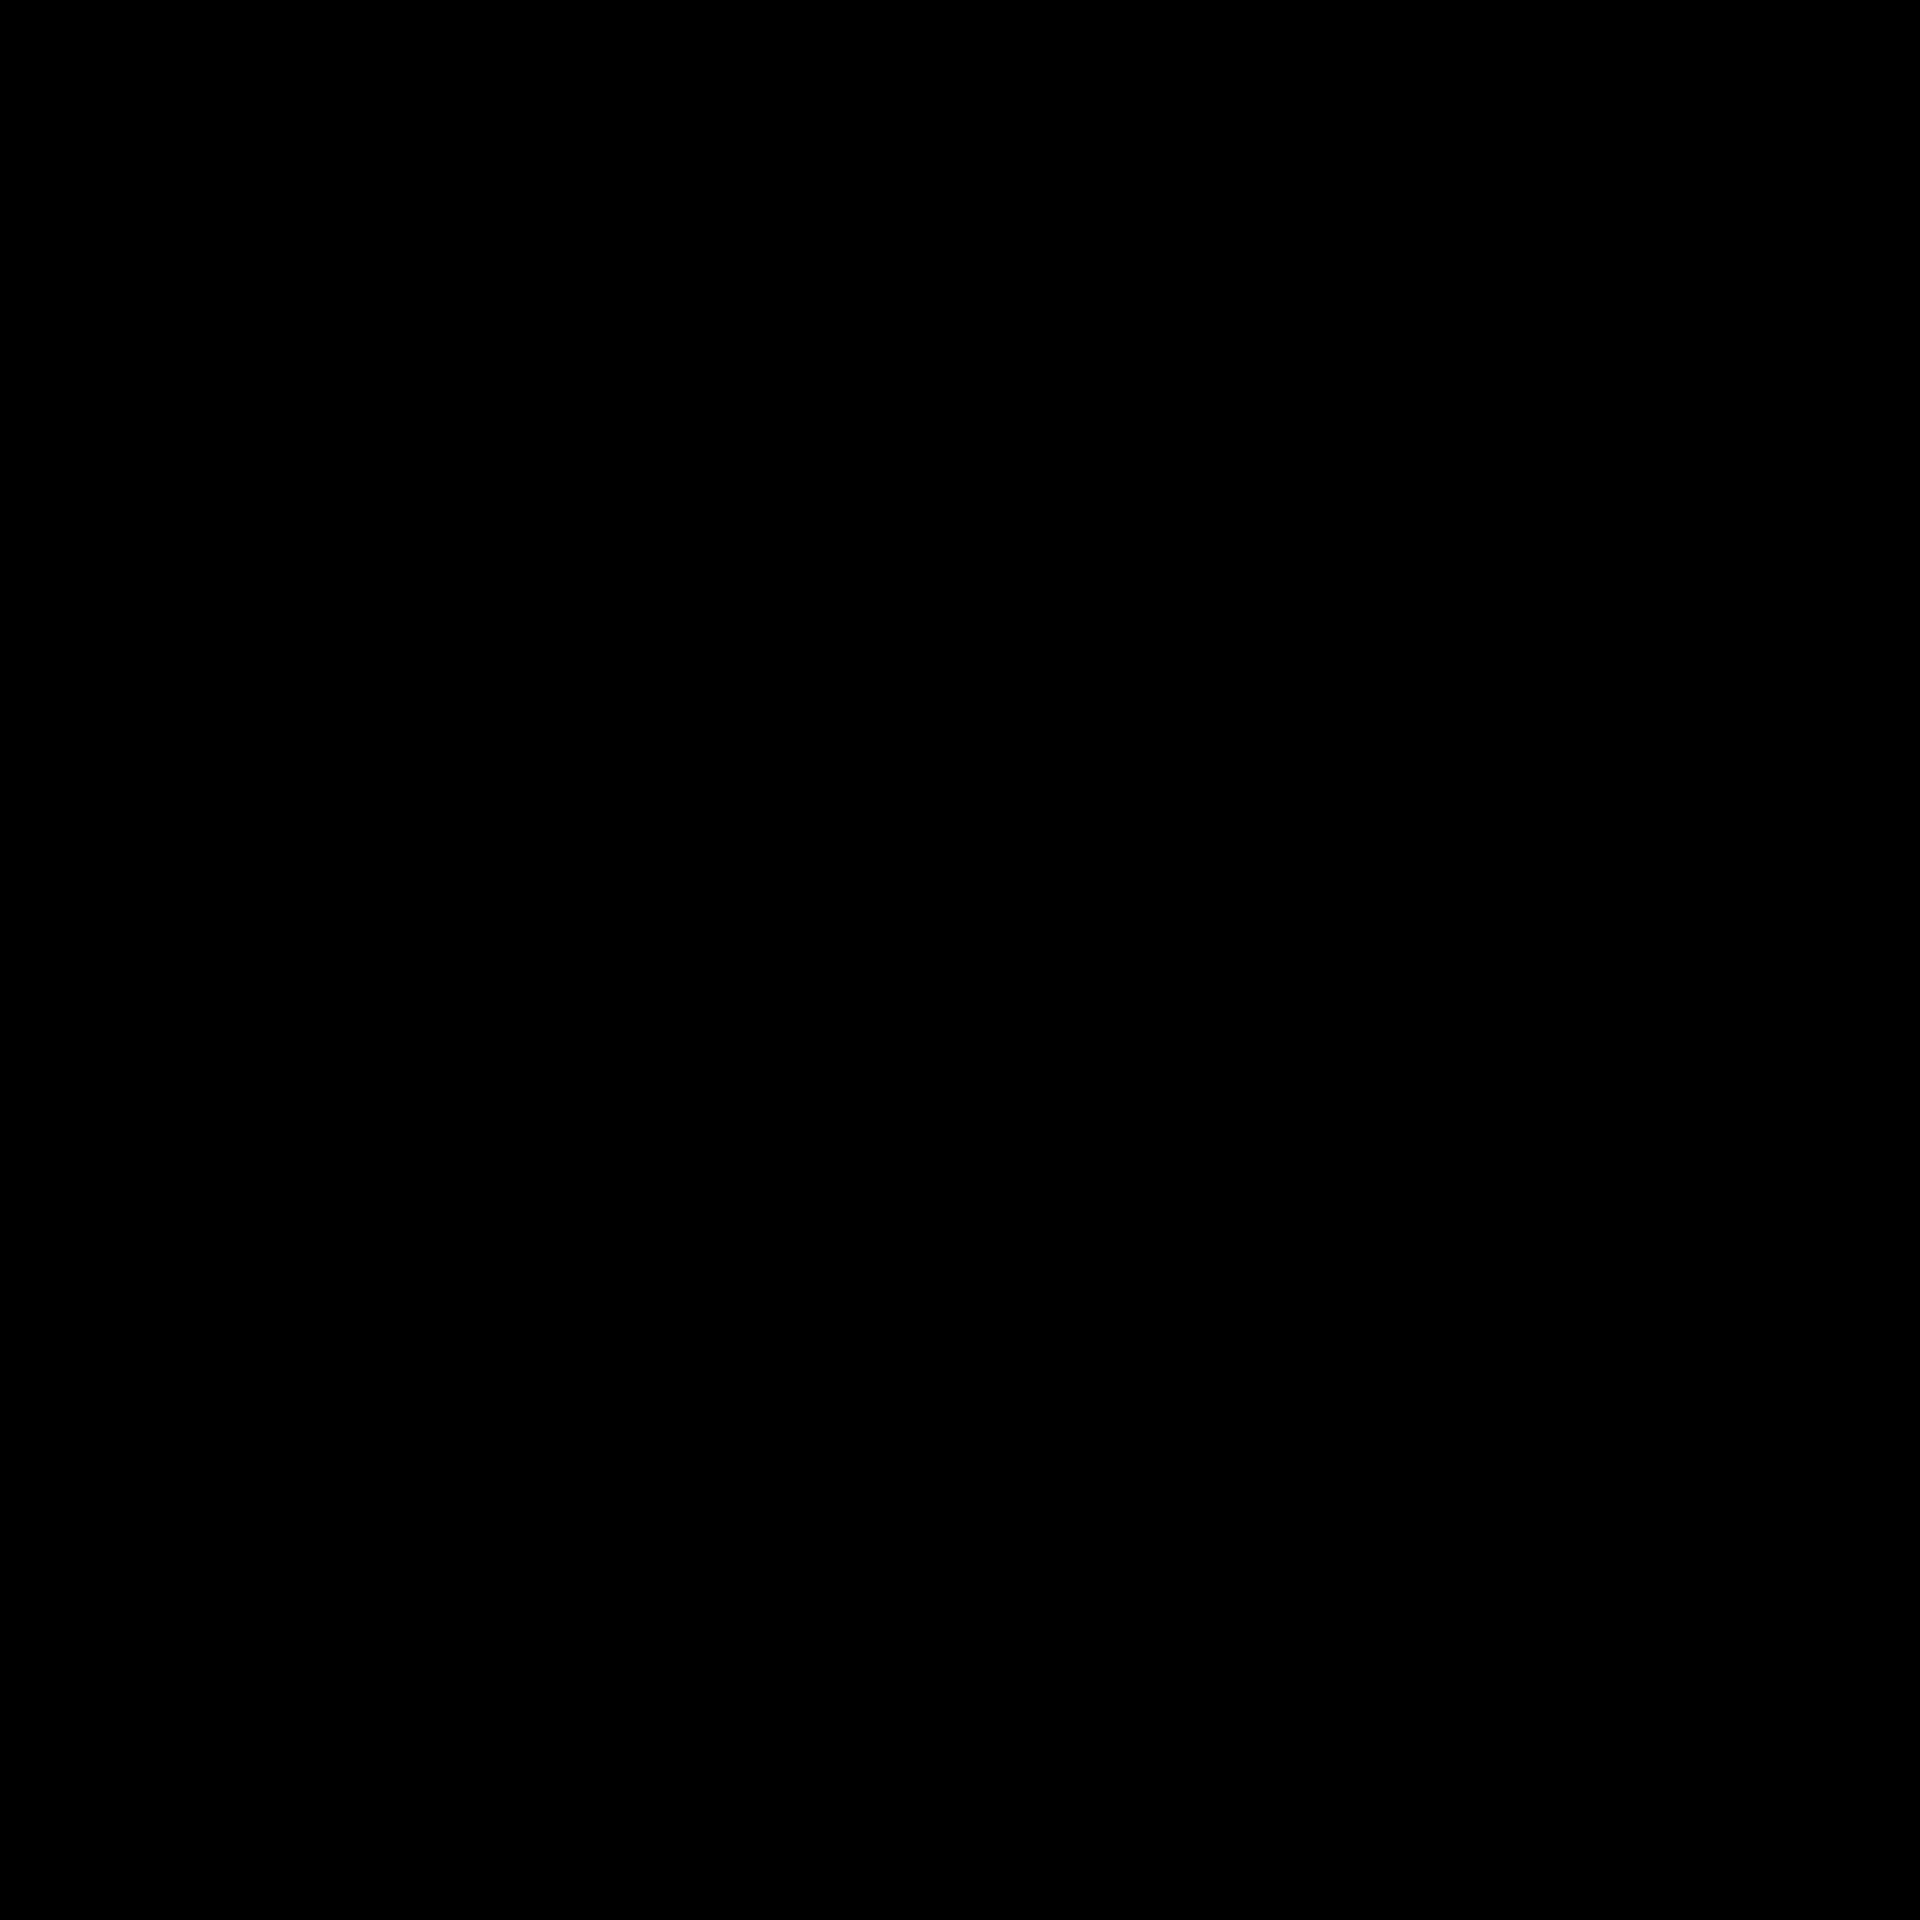 icon-1332774_1920